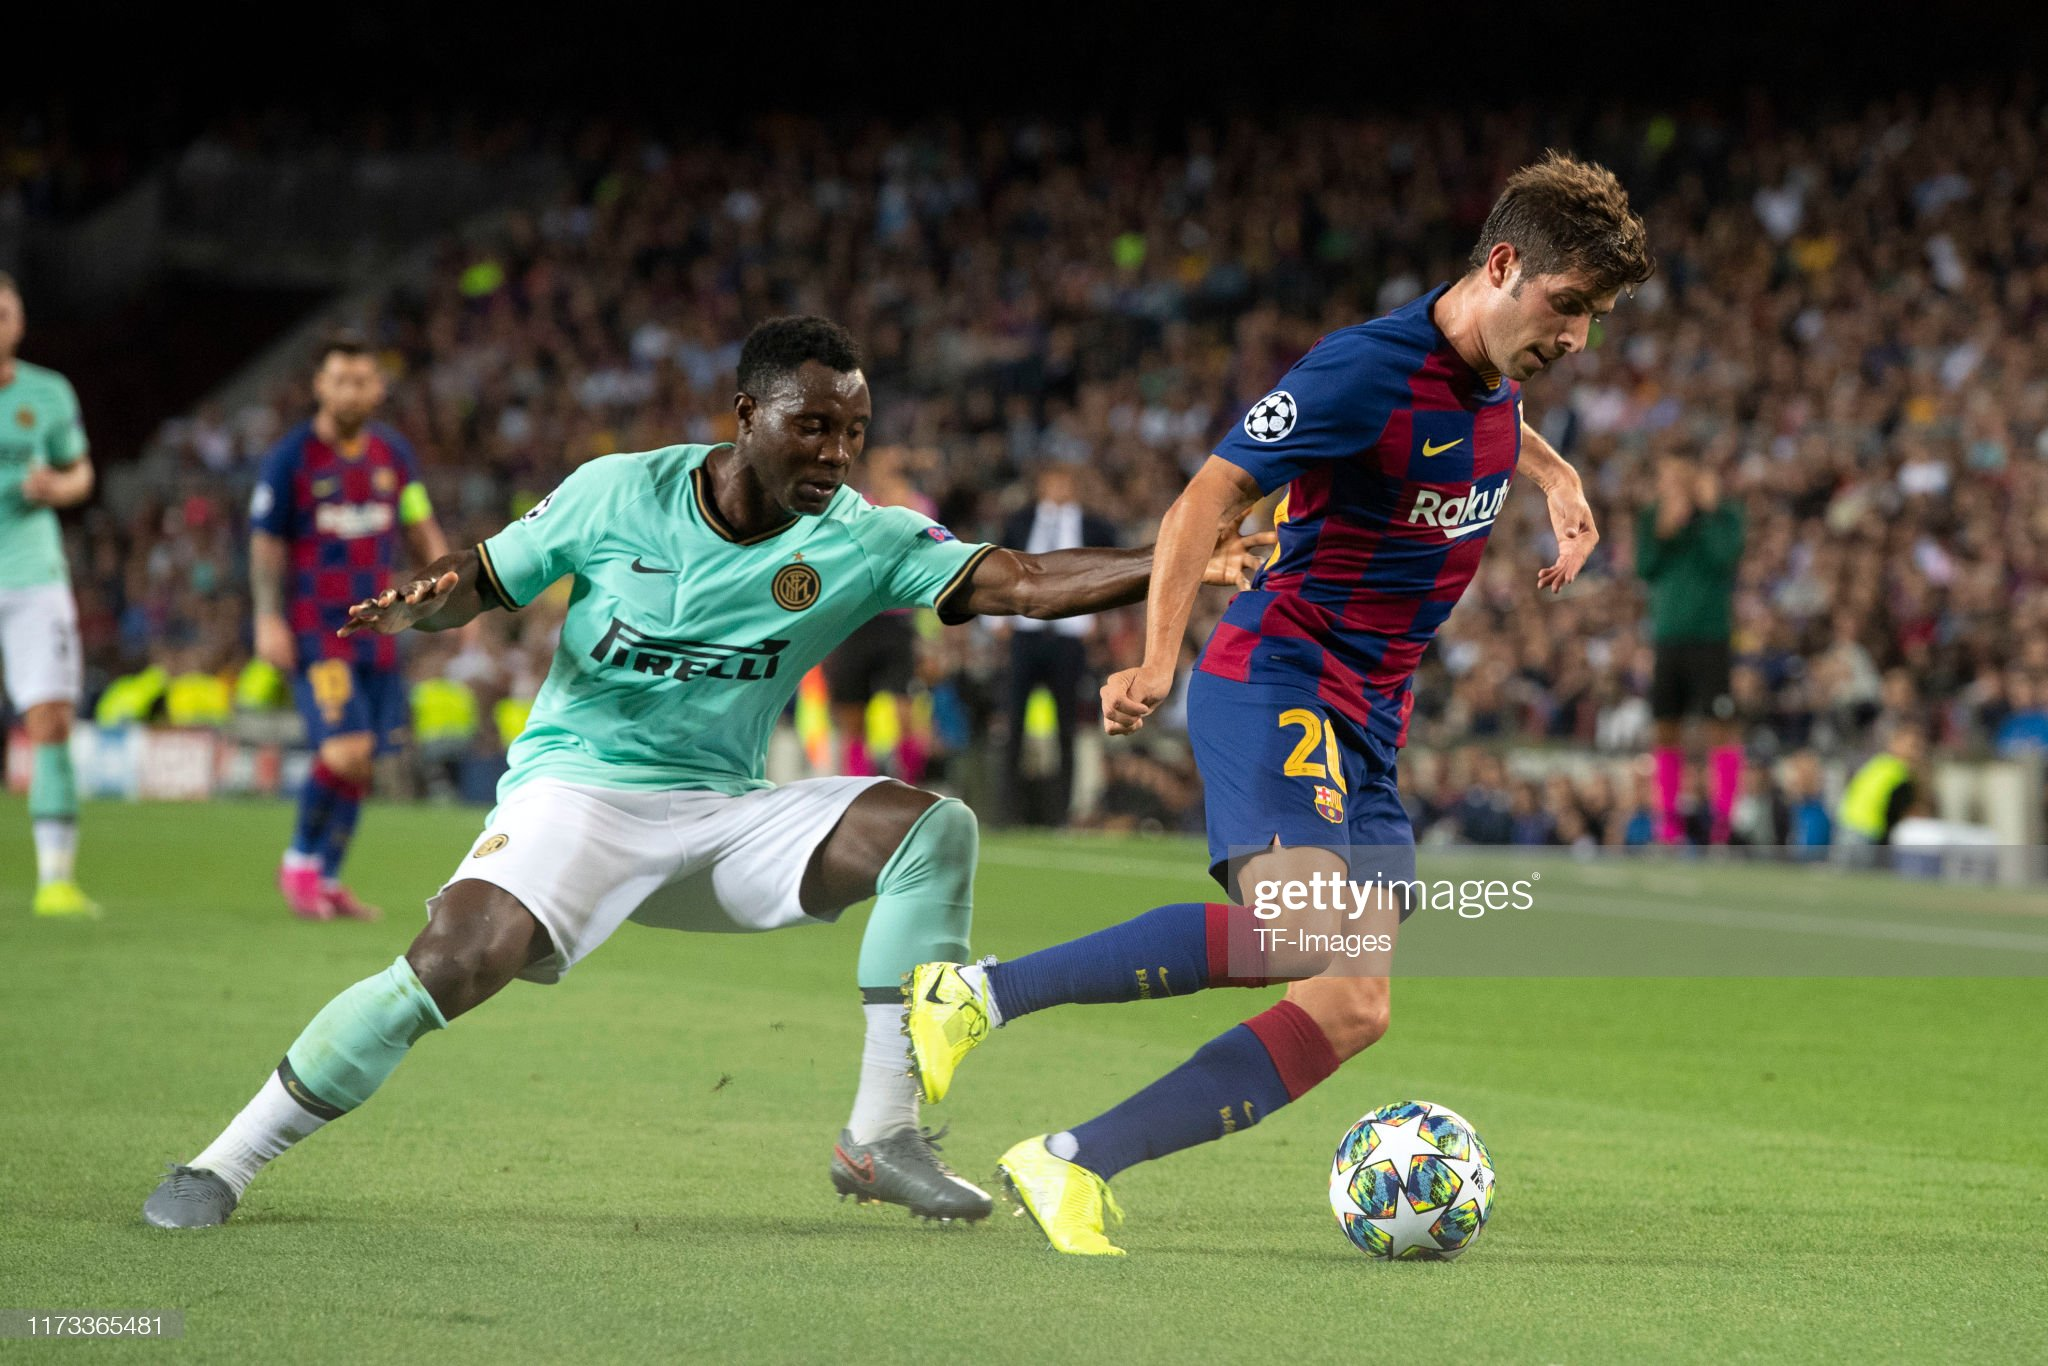 صور مباراة : برشلونة - إنتر 2-1 ( 02-10-2019 )  Sergi-roberto-of-fc-barcelona-and-lucien-agoume-of-fc-barcelona-for-picture-id1173365481?s=2048x2048